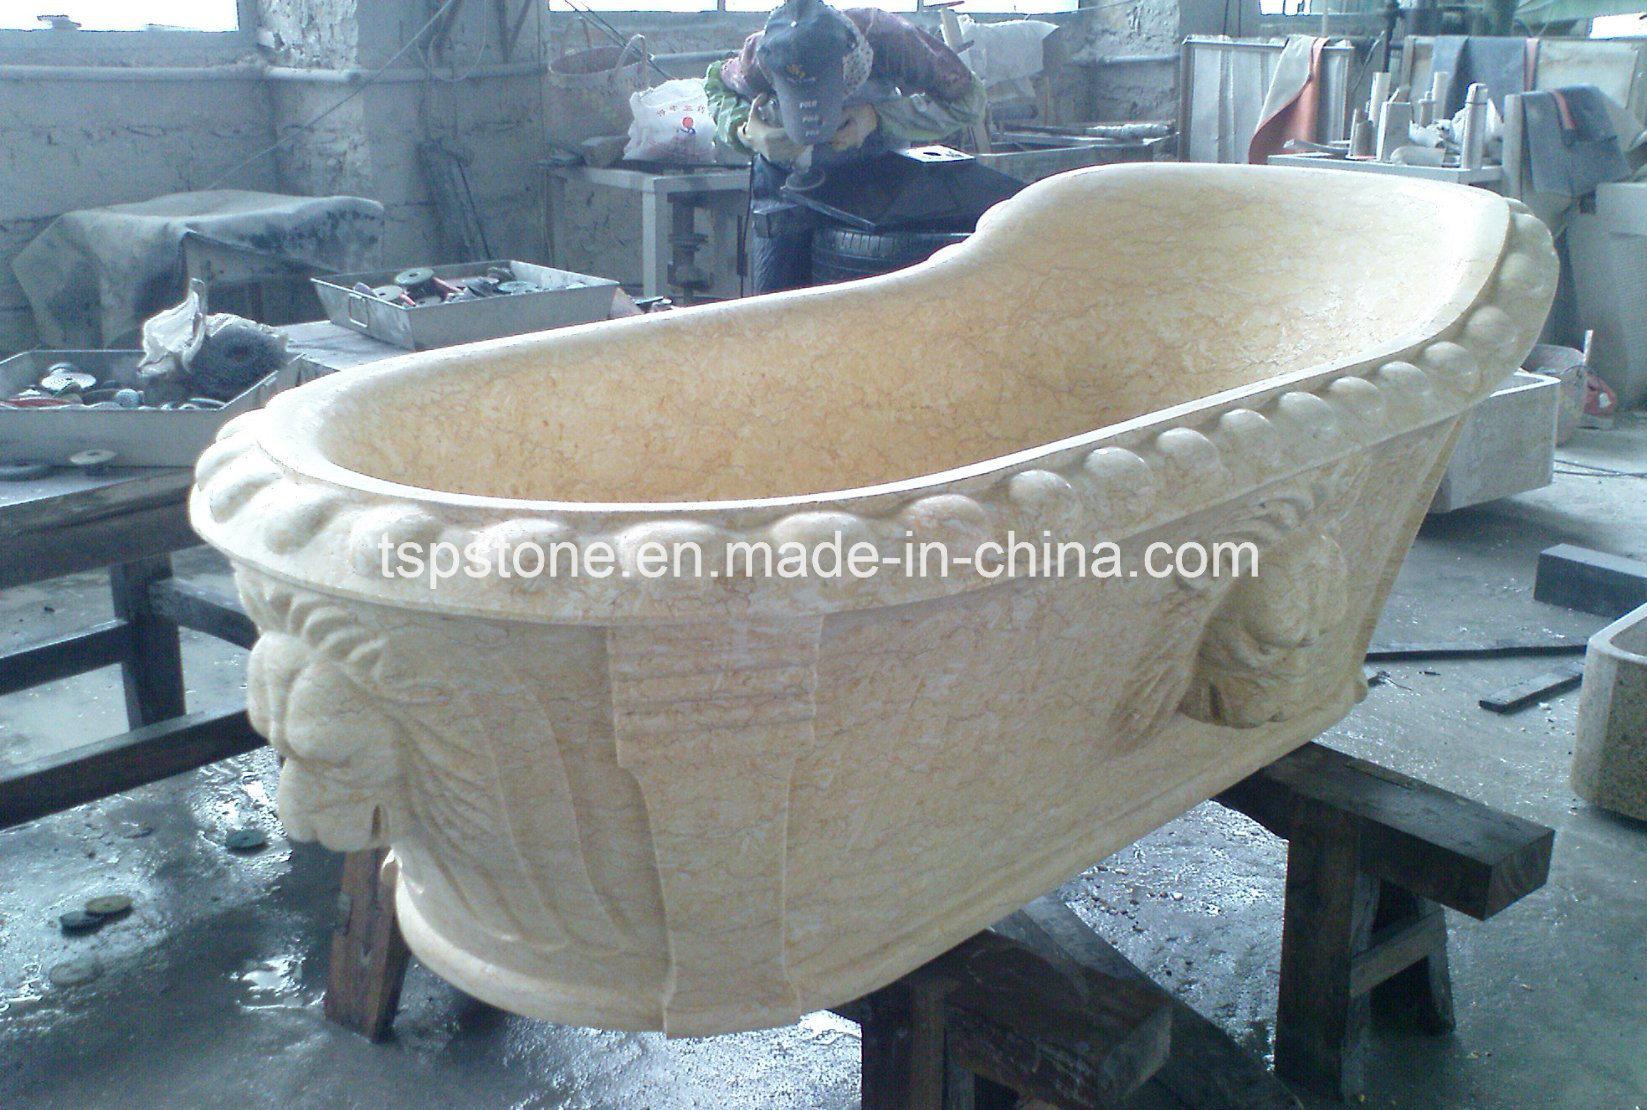 China Natural Pedestal Granite/Marble Stone Bathtub for Select ...